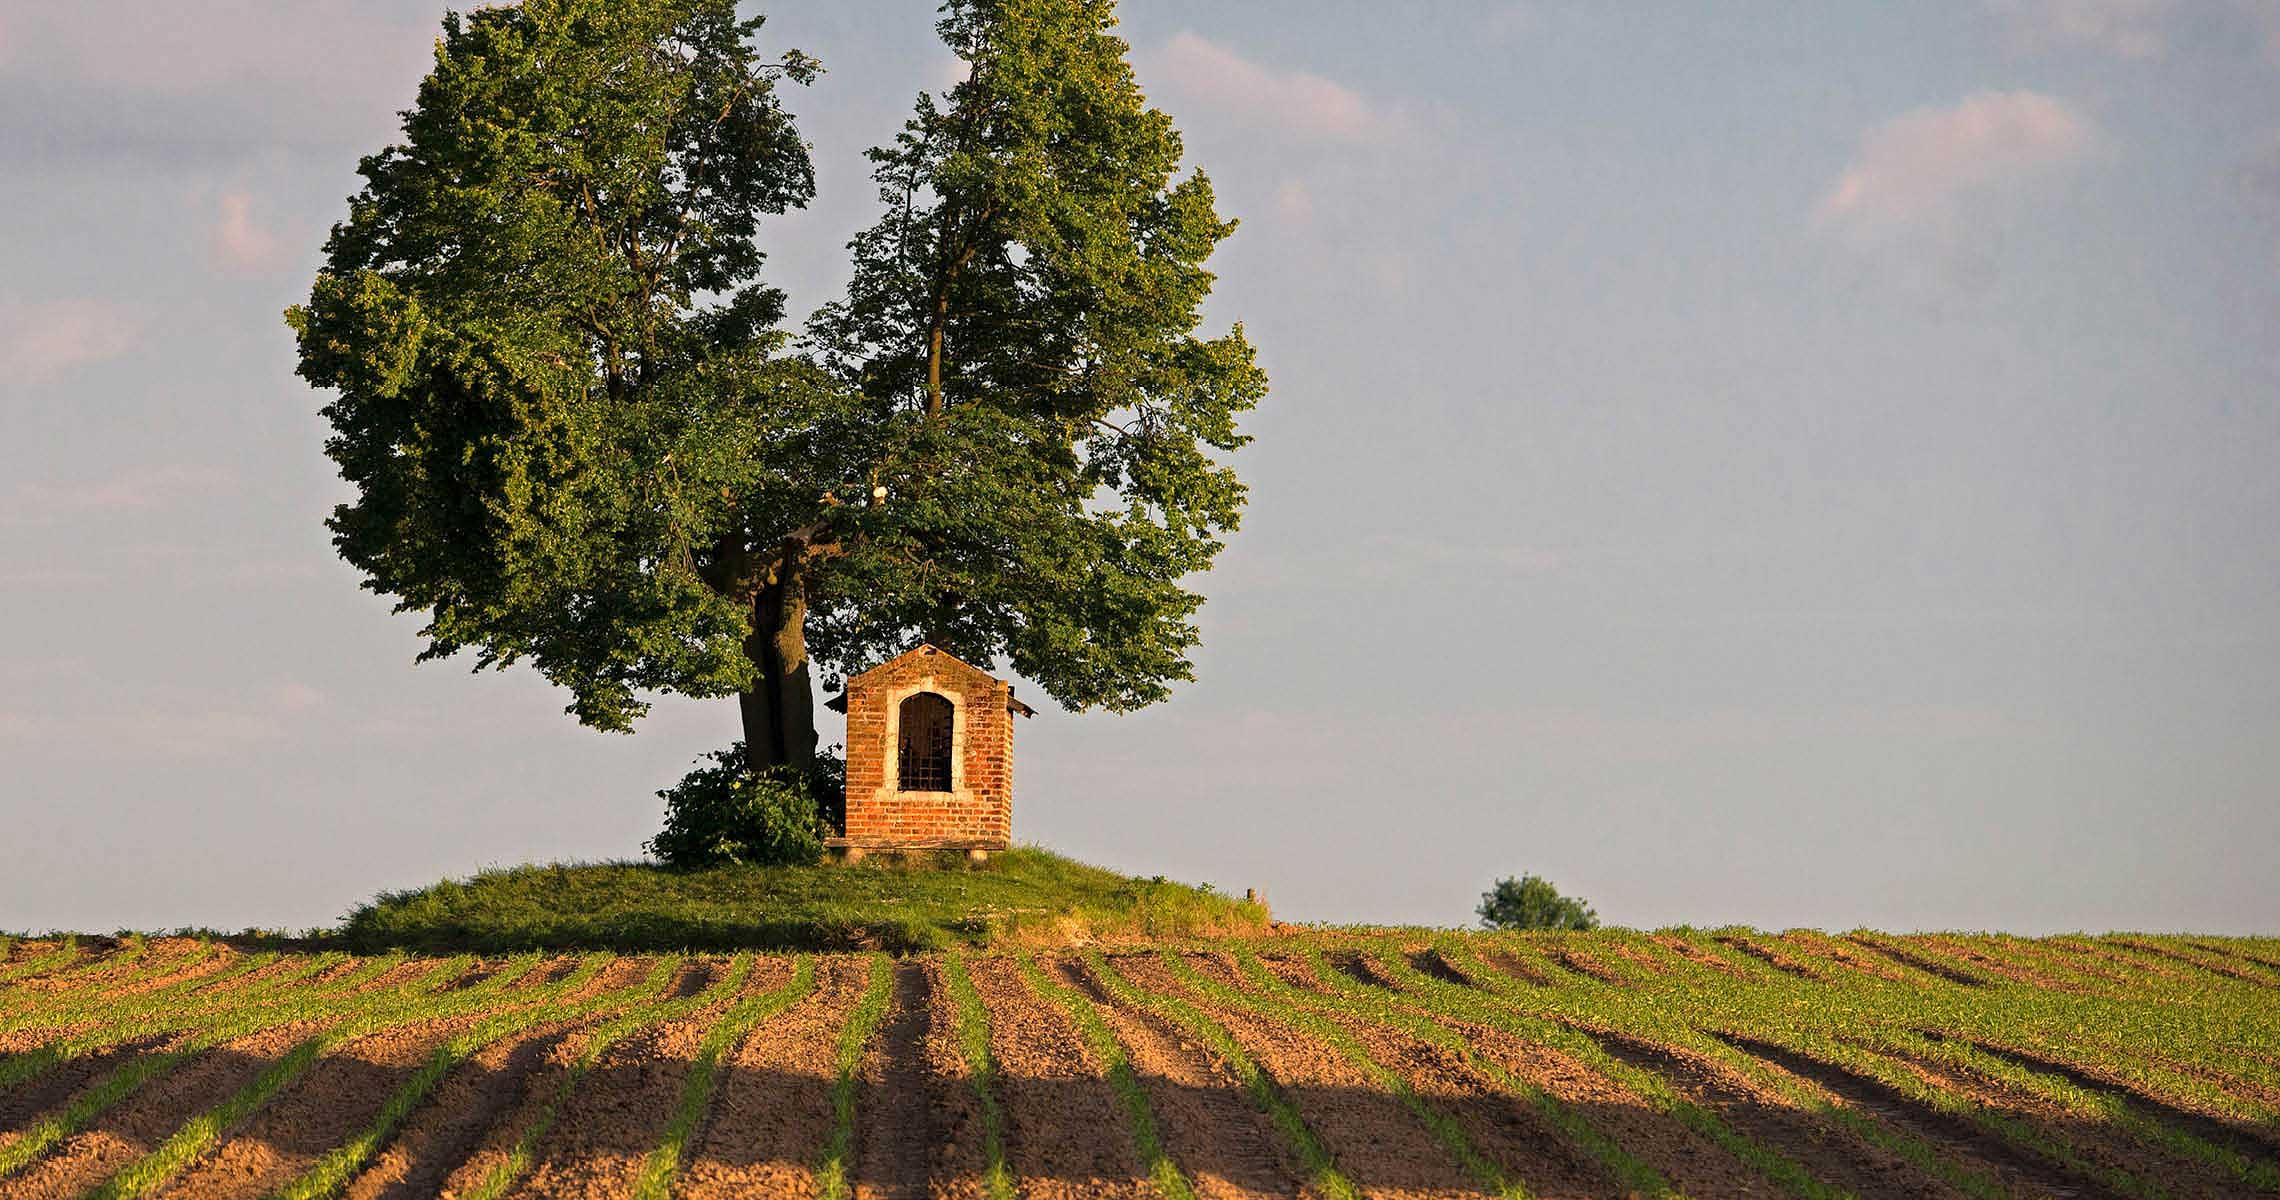 Chantry solitary oak